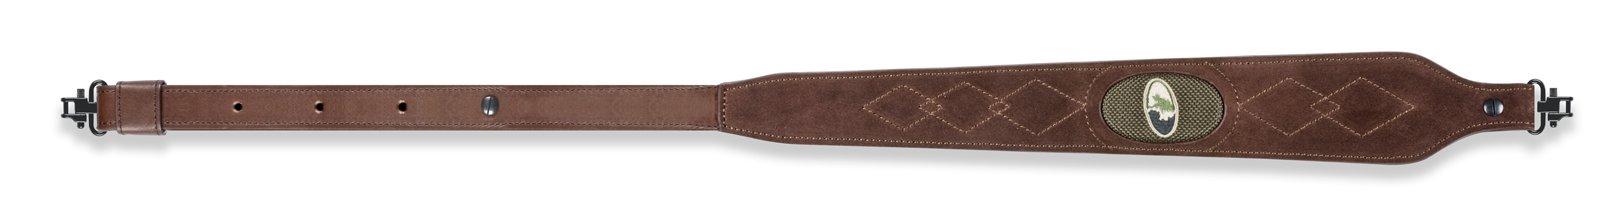 Mossy Oak Mason Creek Leather Sling